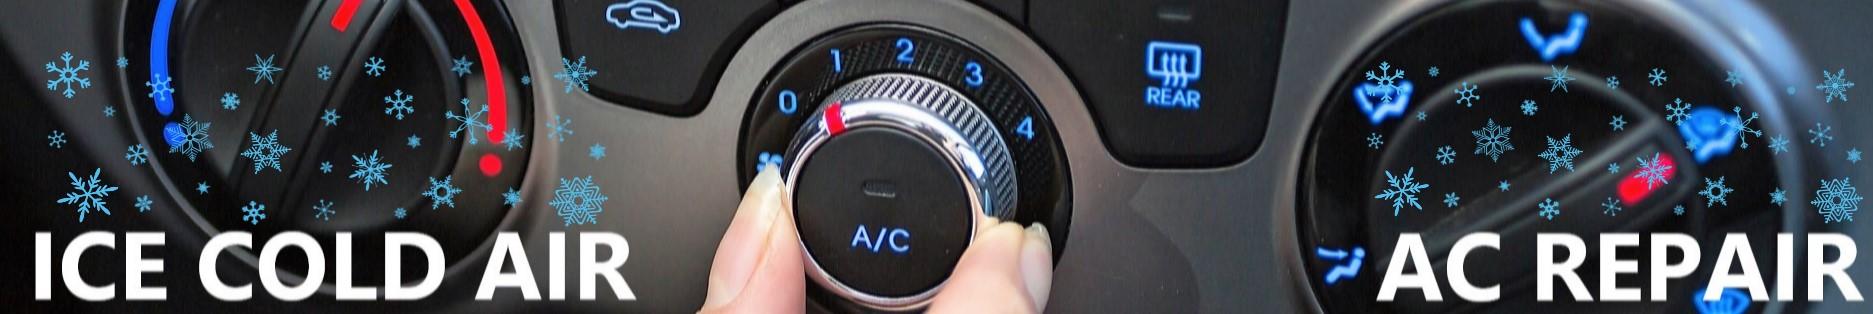 Car AC Recharge Near Me | Car AC Recharge Hopewell Jct